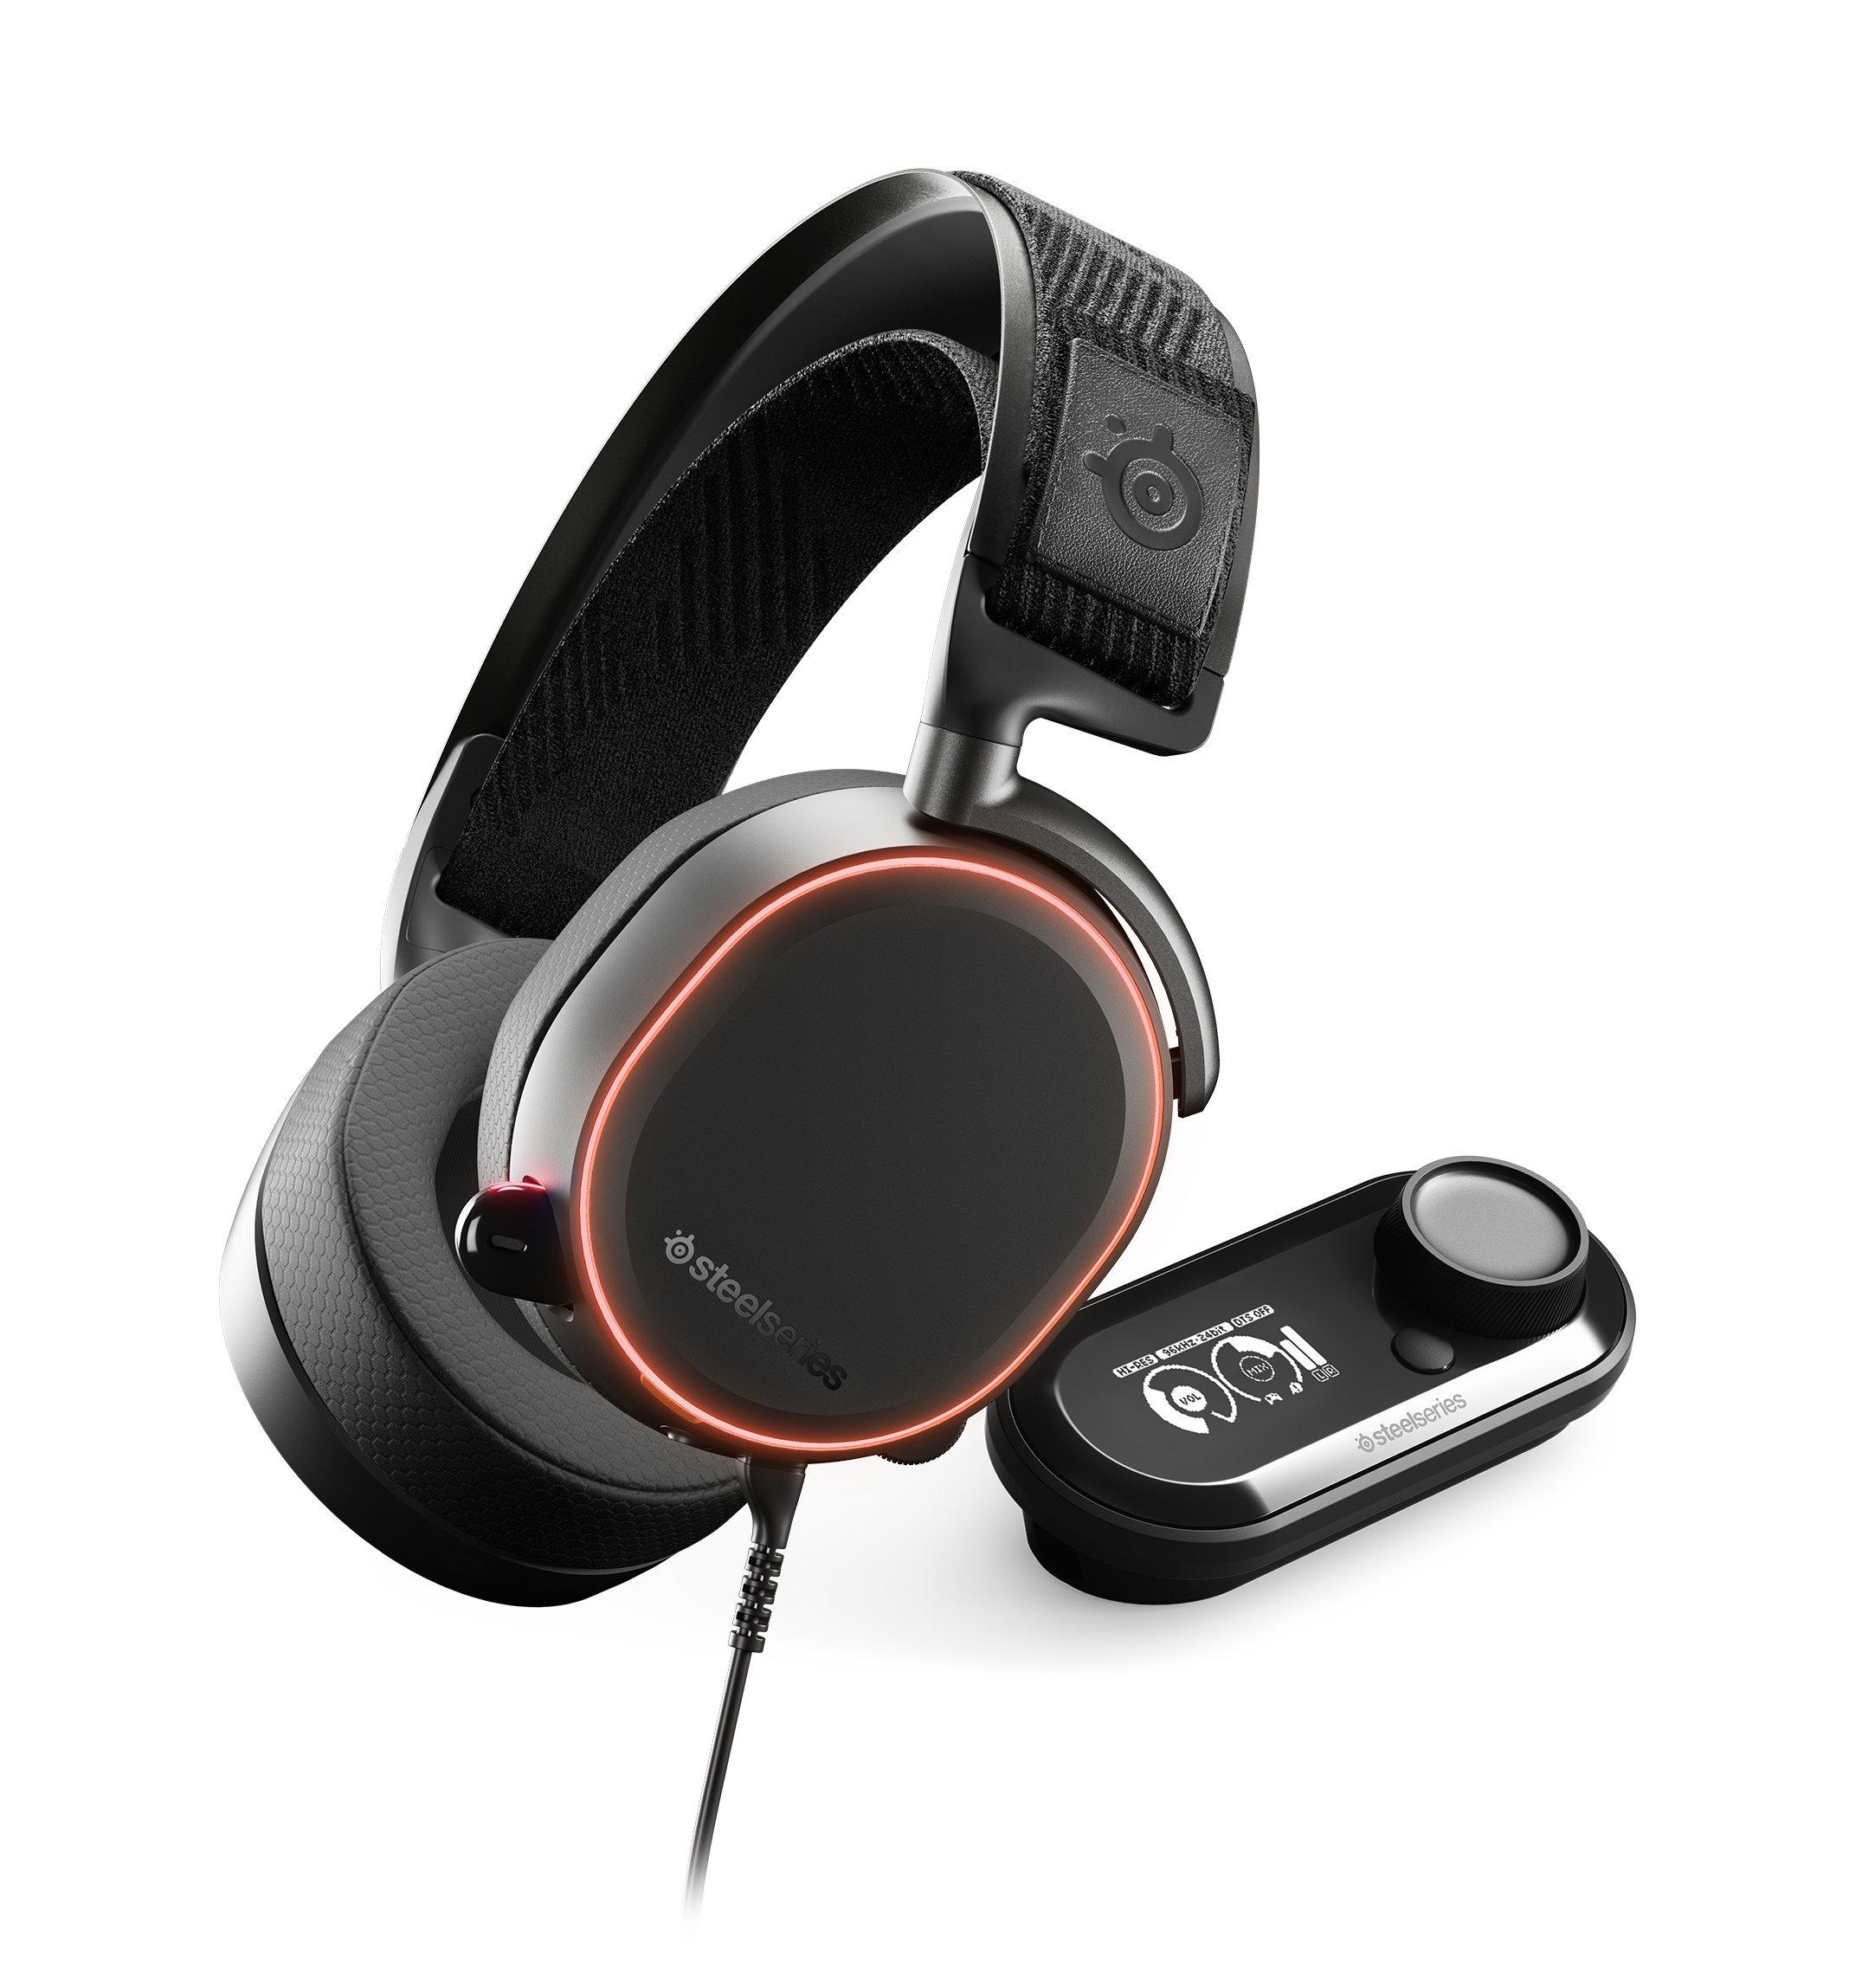 Auriculares Gamer : Steelseries Arctis Pro + Gamedac Certif